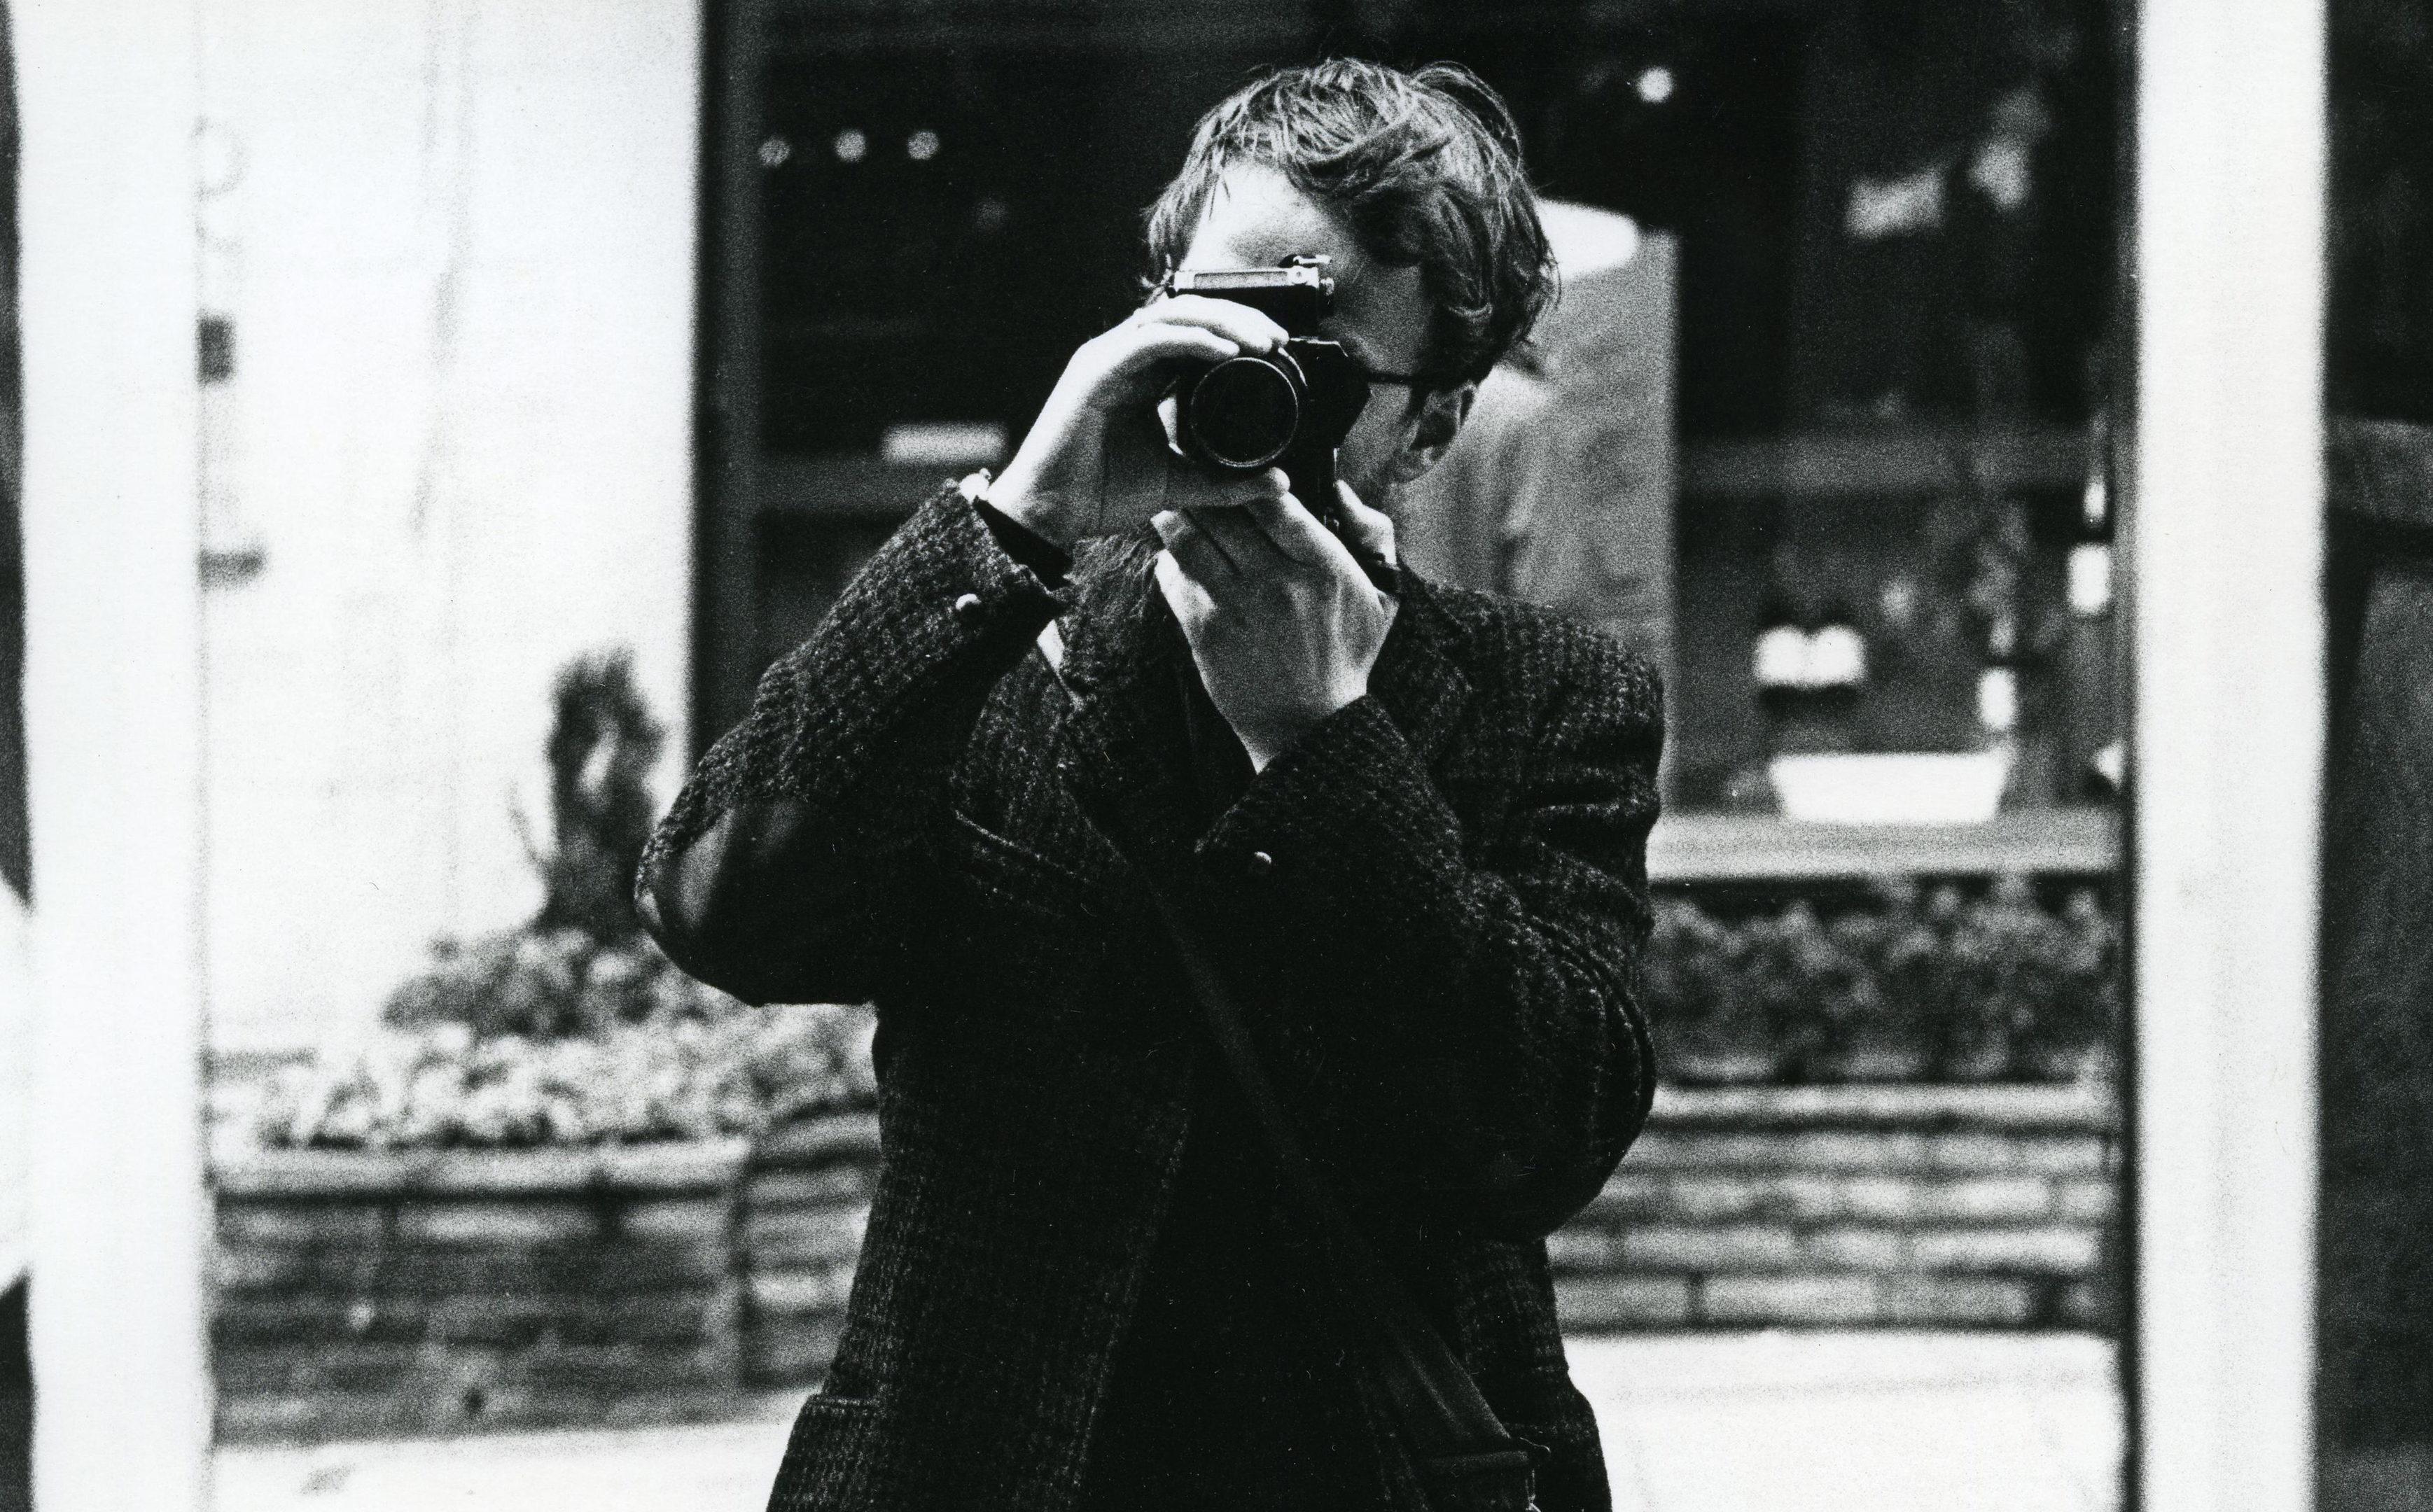 Robert Blomfield self-portrait (Robert Blomfield)